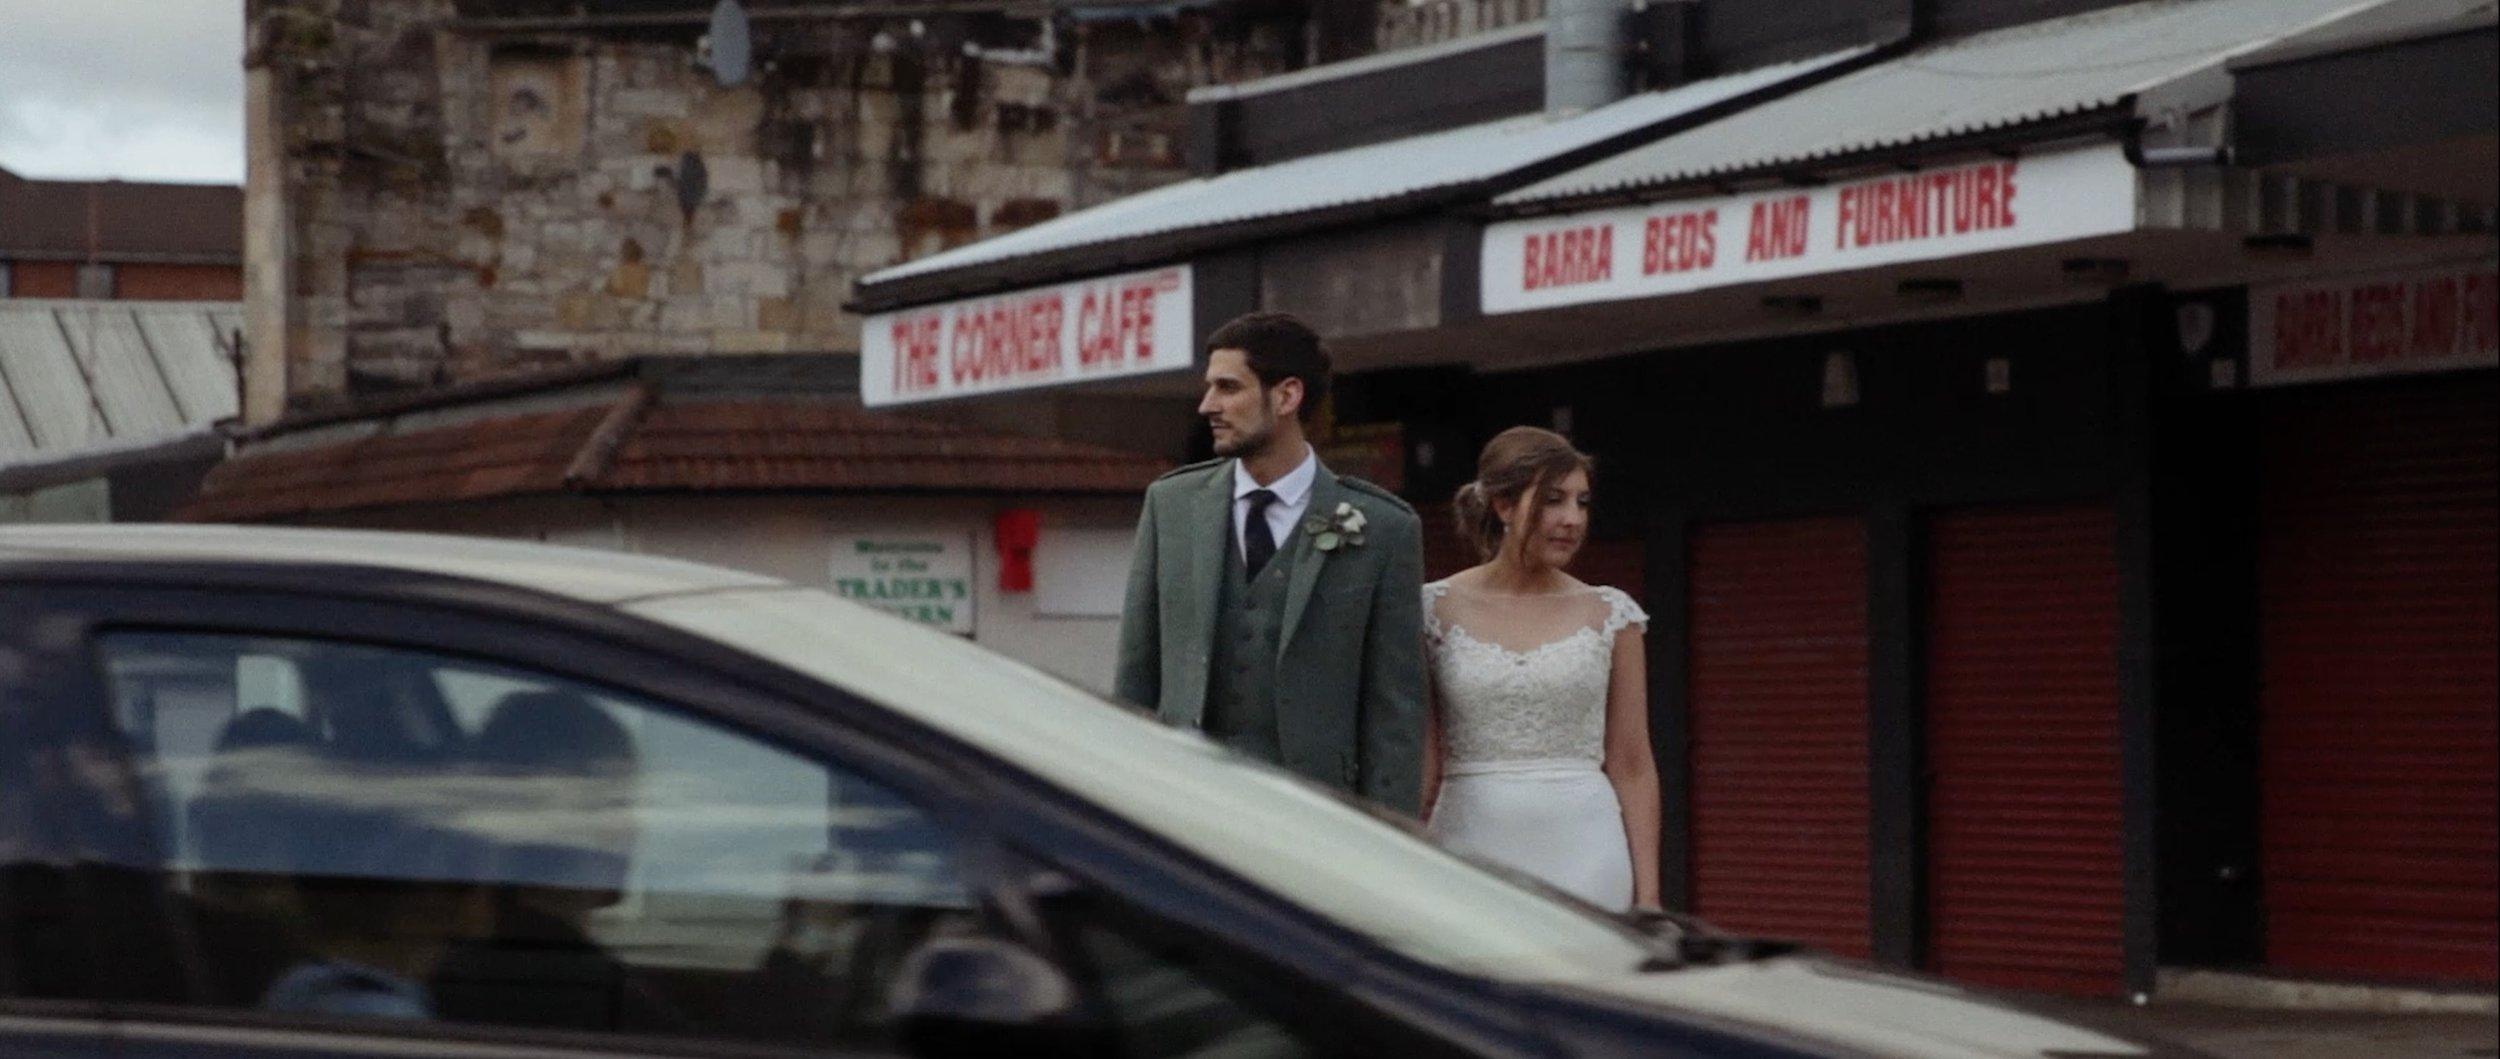 the-byre-at-inchyra-wedding-videographer_LL_05.jpg